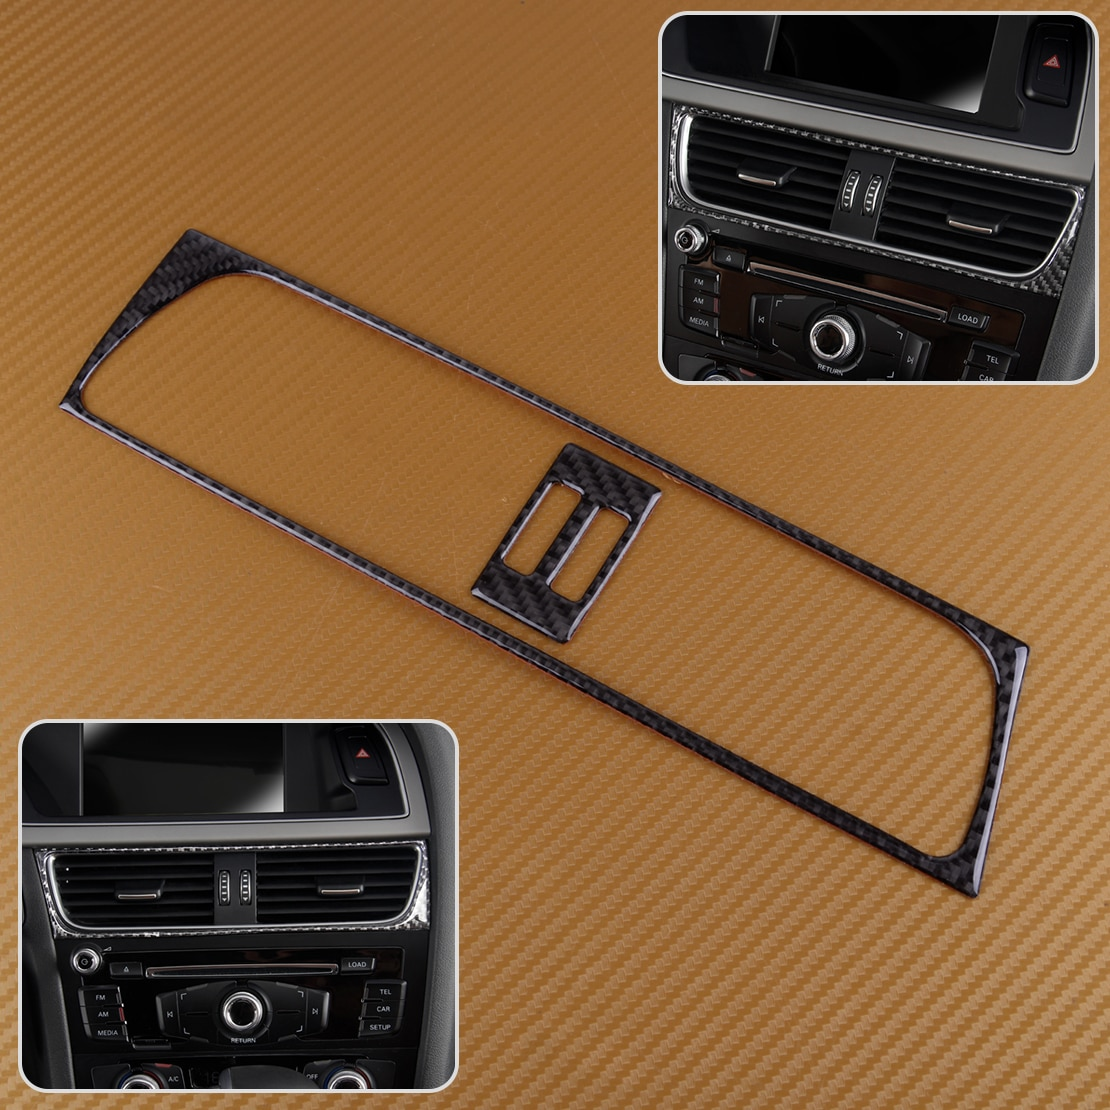 Beler de fibra de carbono estilo consola acondicionador de aire de salida cubierta de ventilación Trim para Audi A4 A5 Q5 2013, 2014, 2015, 2016